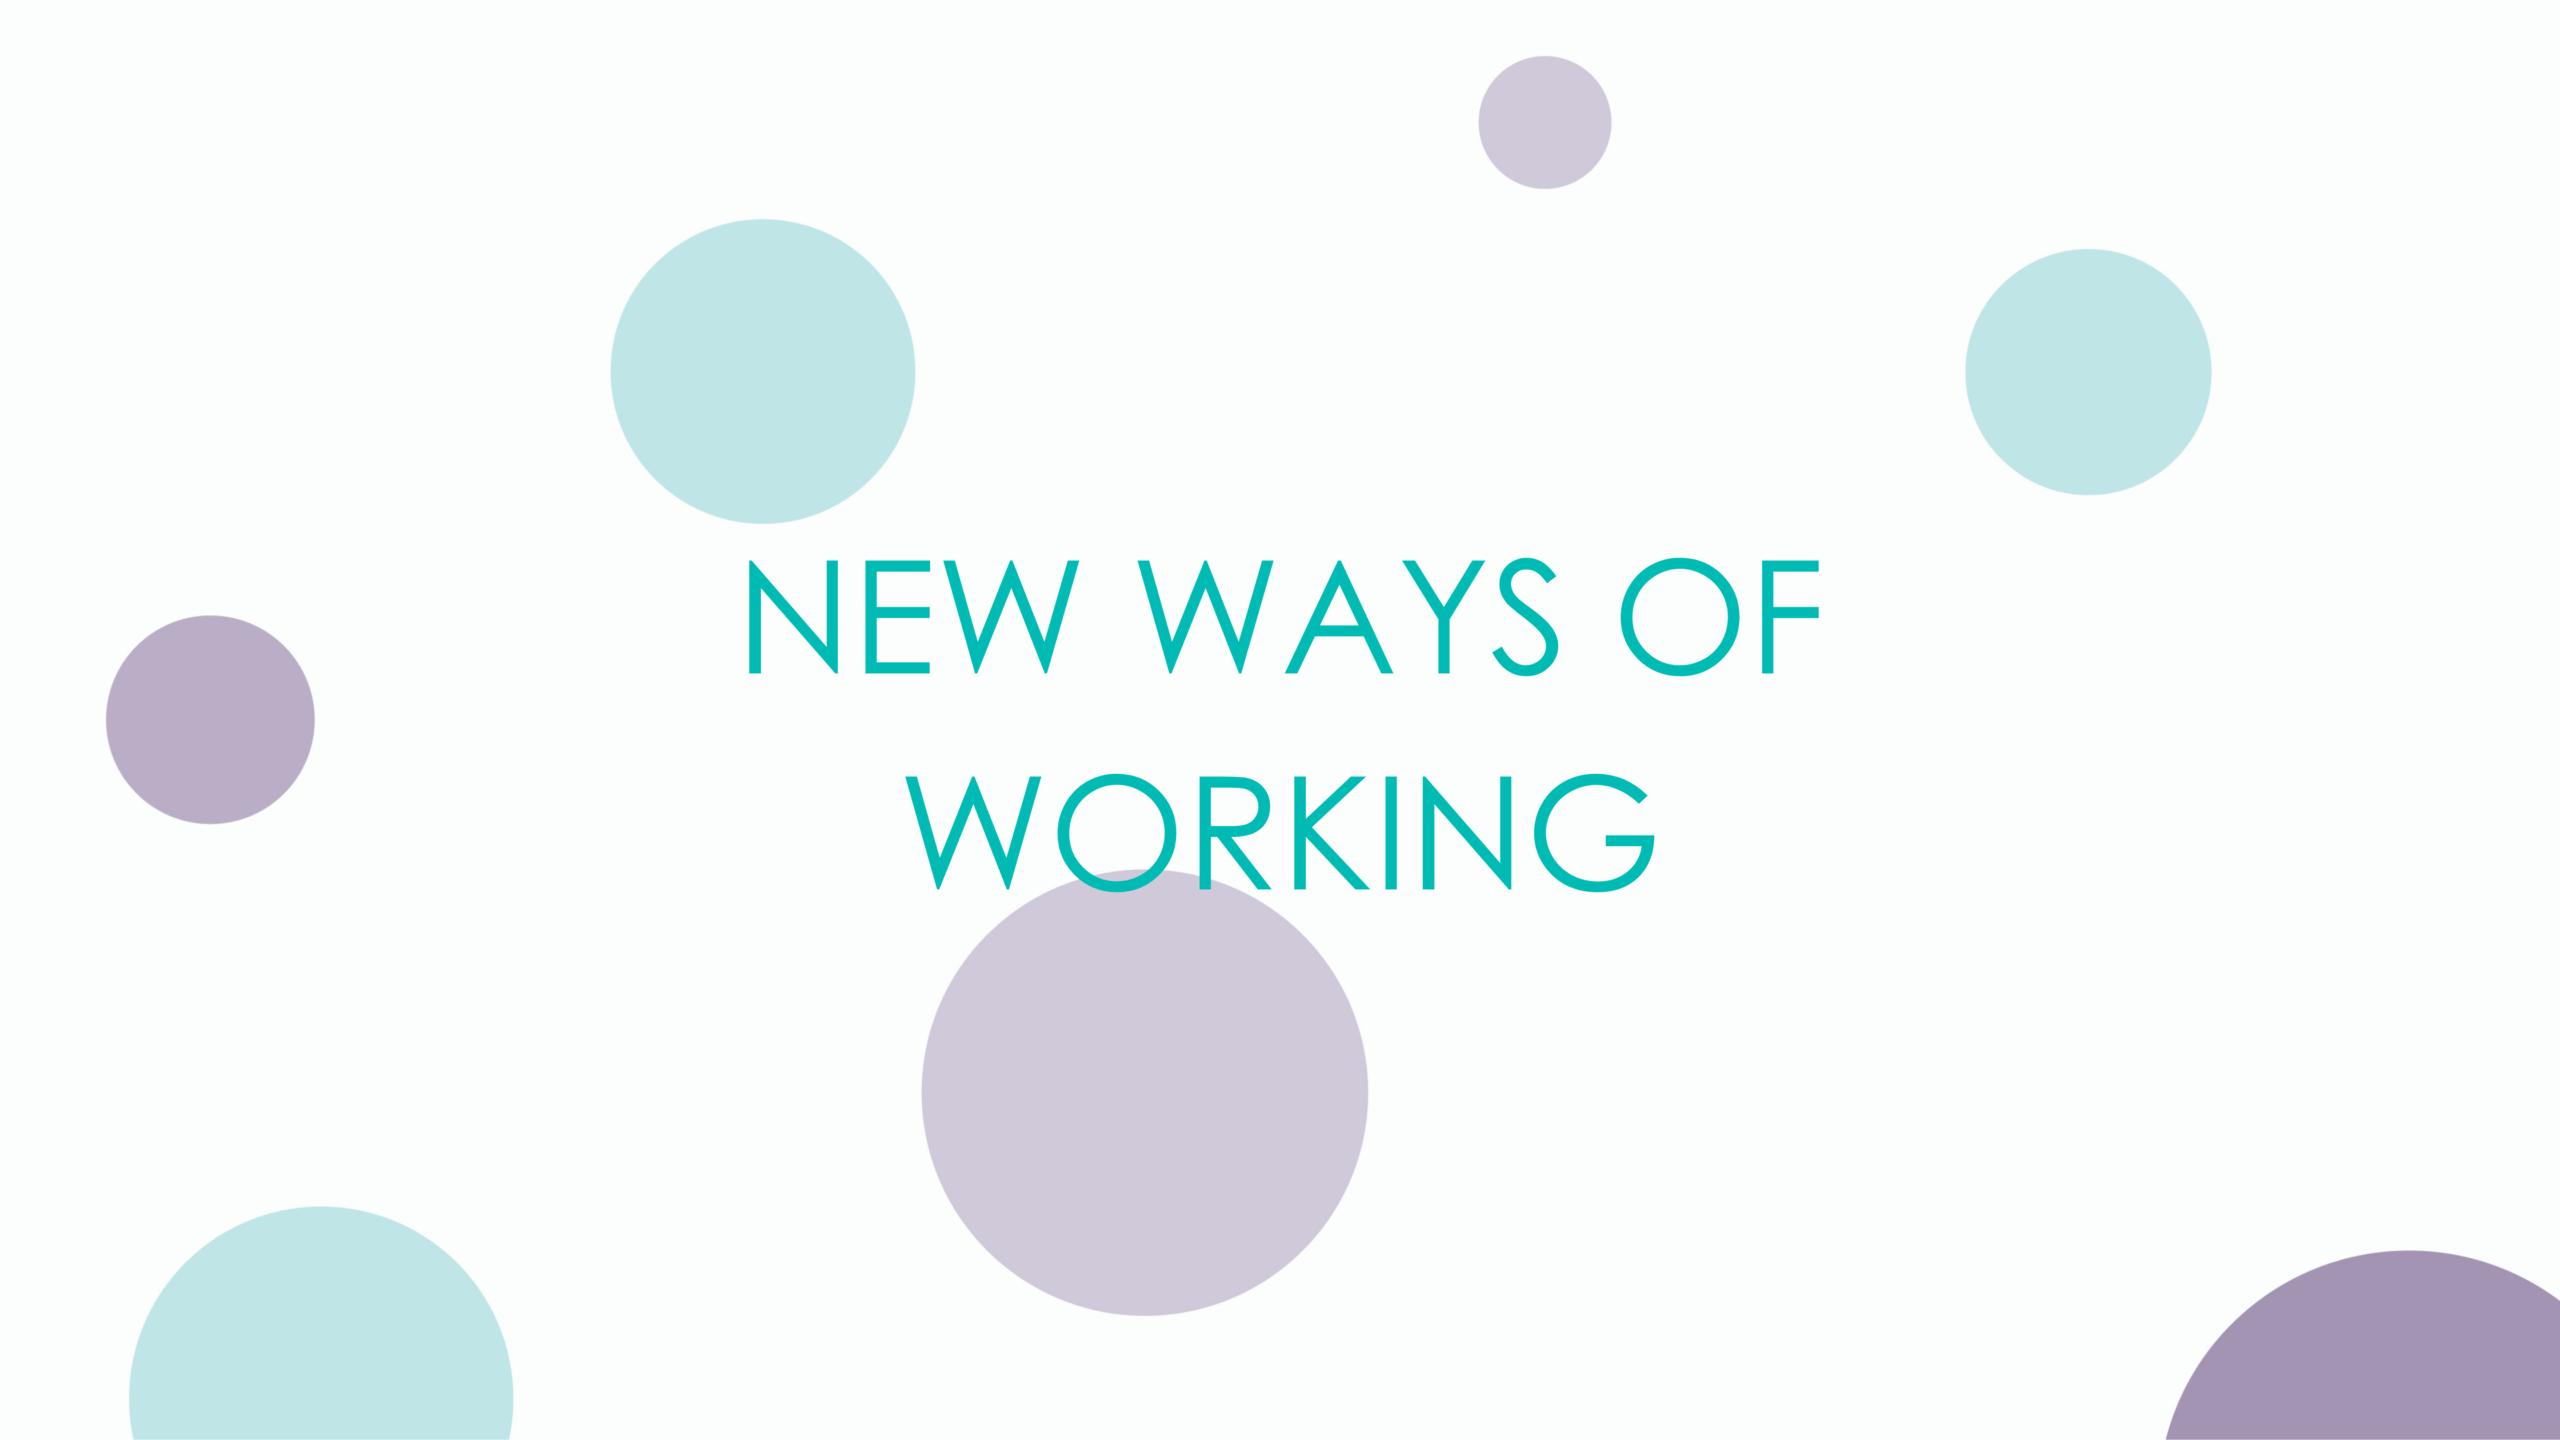 NEW WAYS OF WORKING